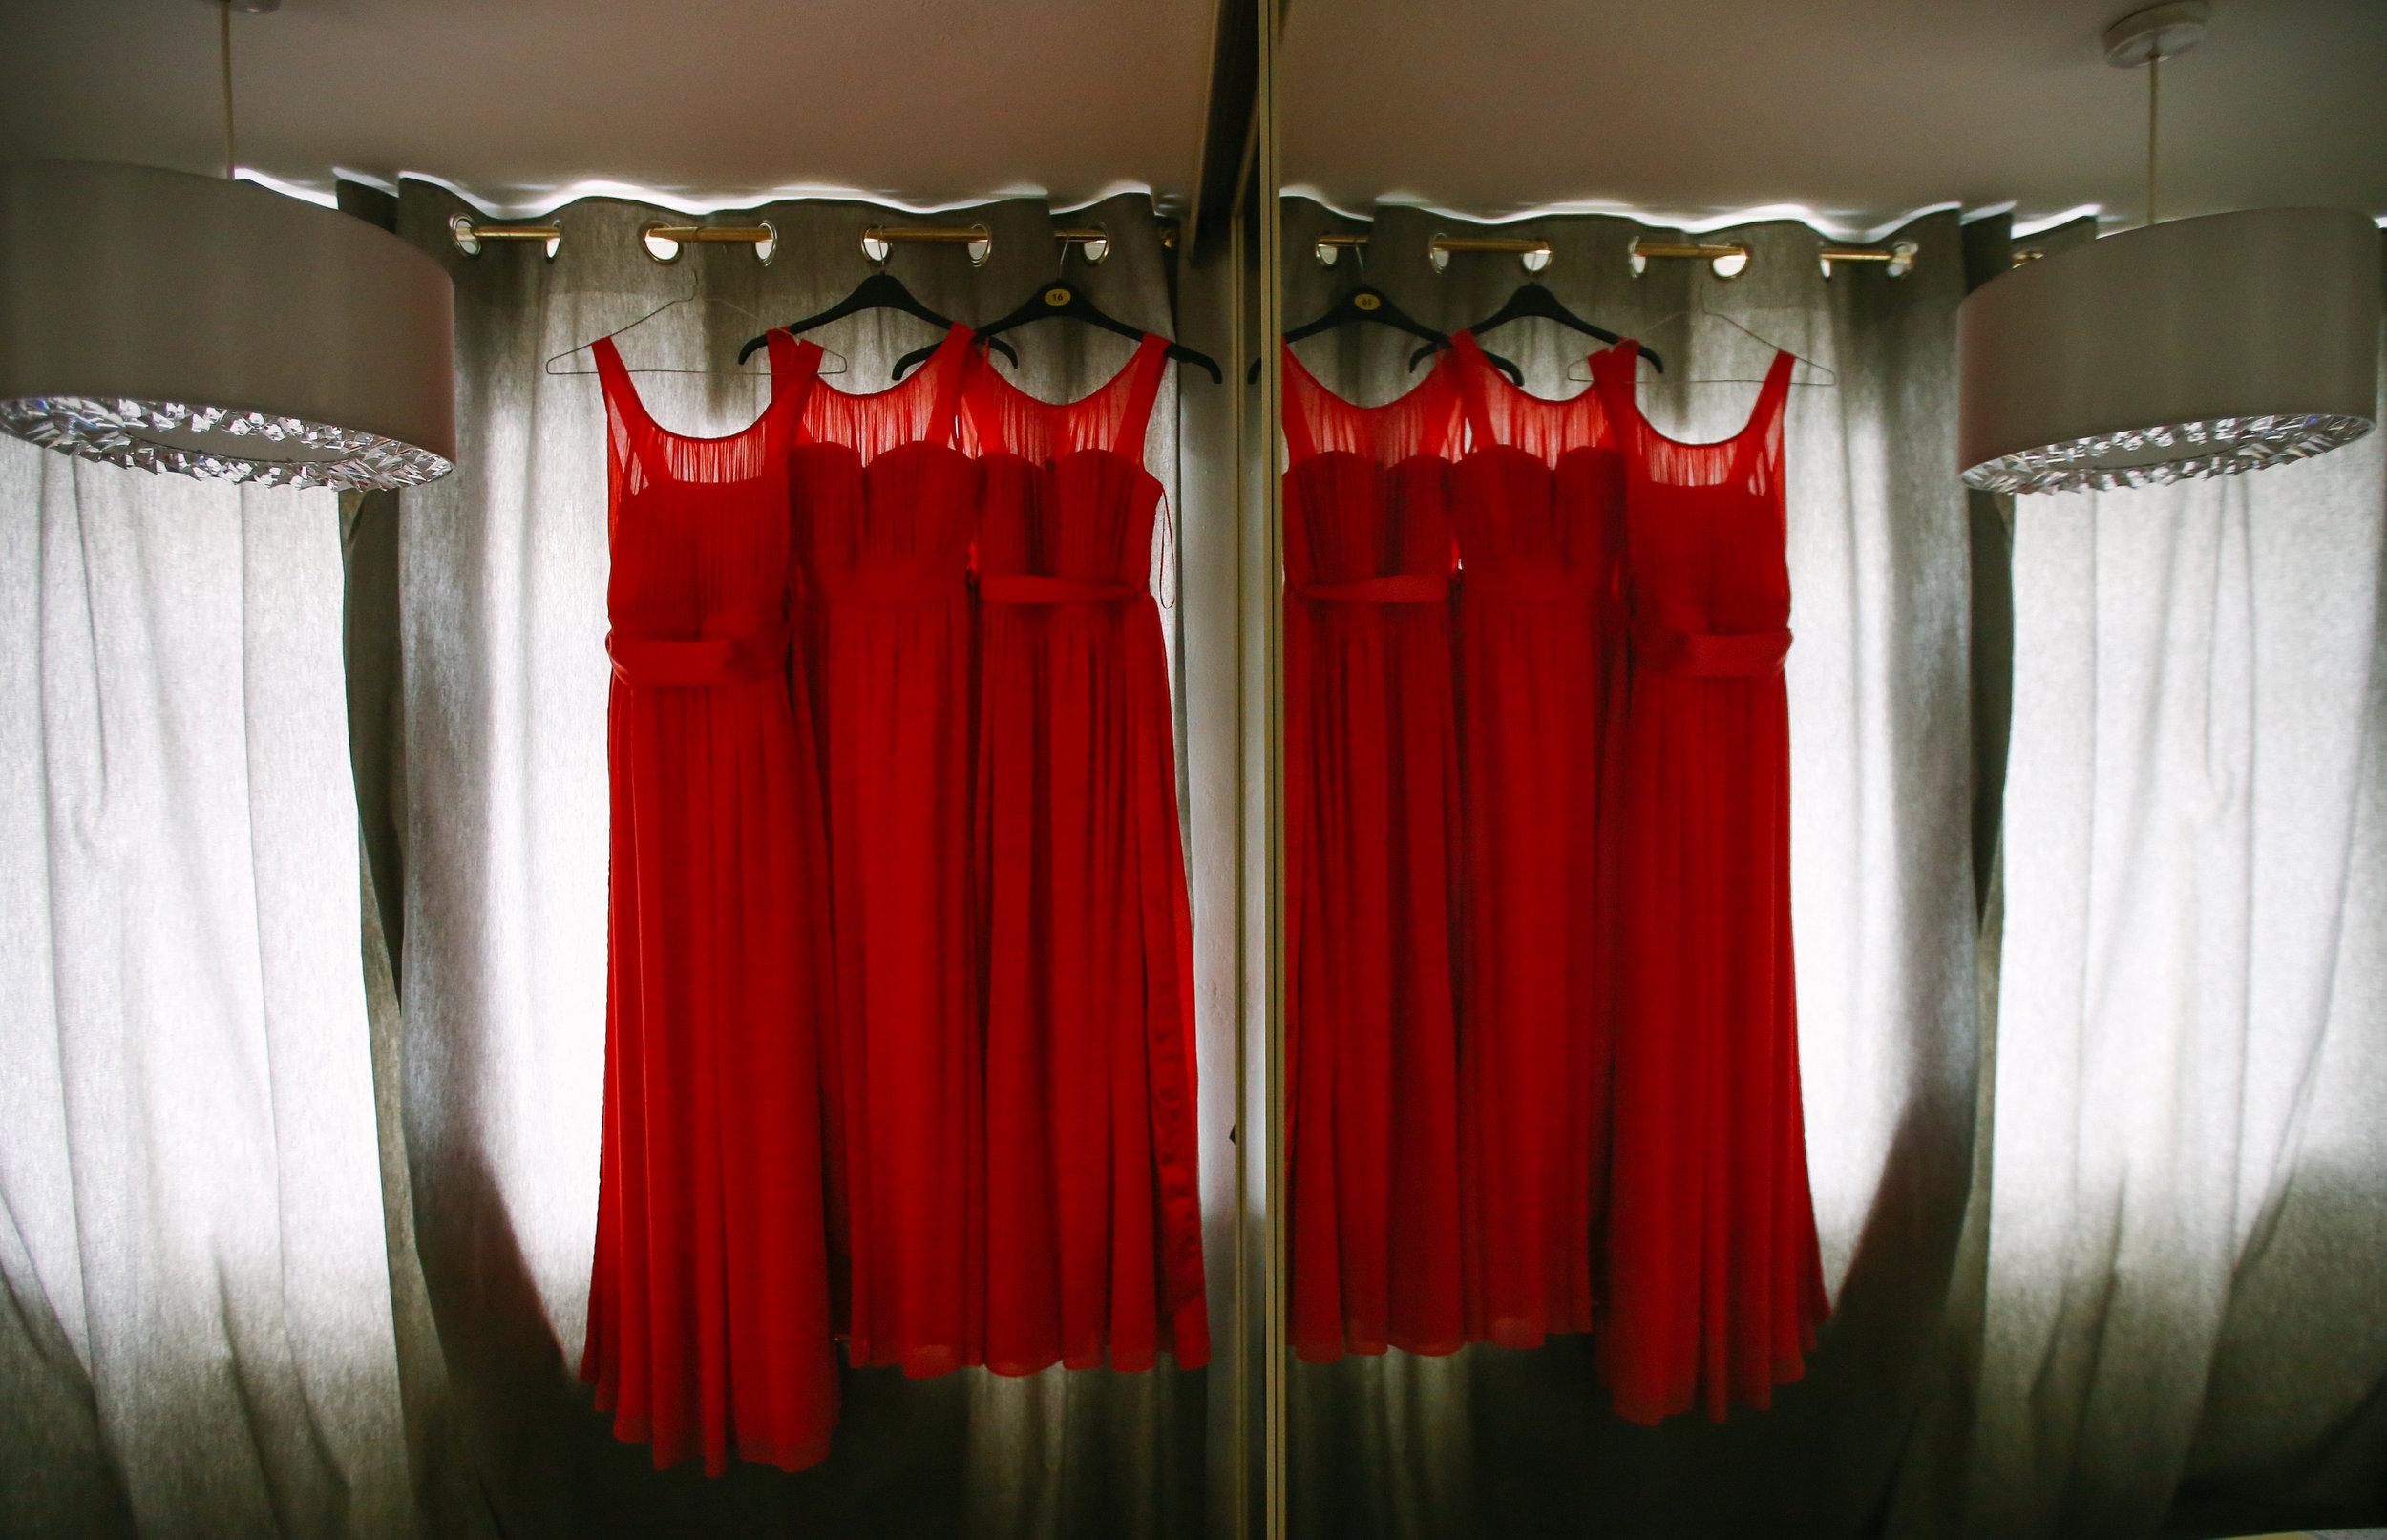 reigate-surrey-london-wedding-photography-bridal-prep-bridesmaids-dress-09